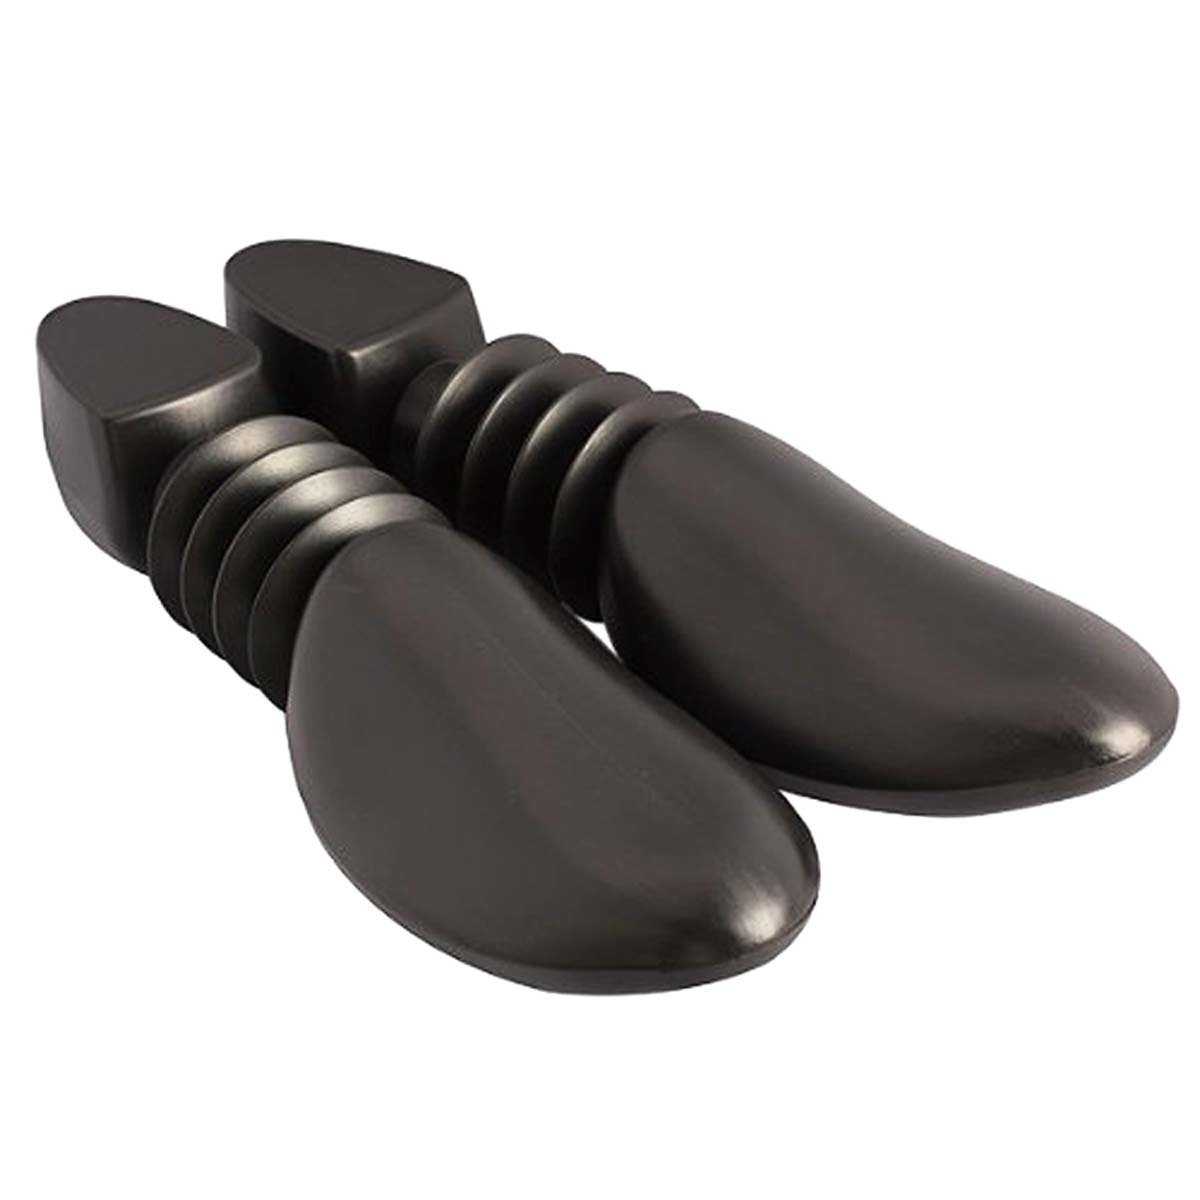 T-ที่ดีที่สุดใน AliExpress โปรโมชั่นสตรีฤดูใบไม้ผลิรองเท้า Stretchcher Shaper สนับสนุน